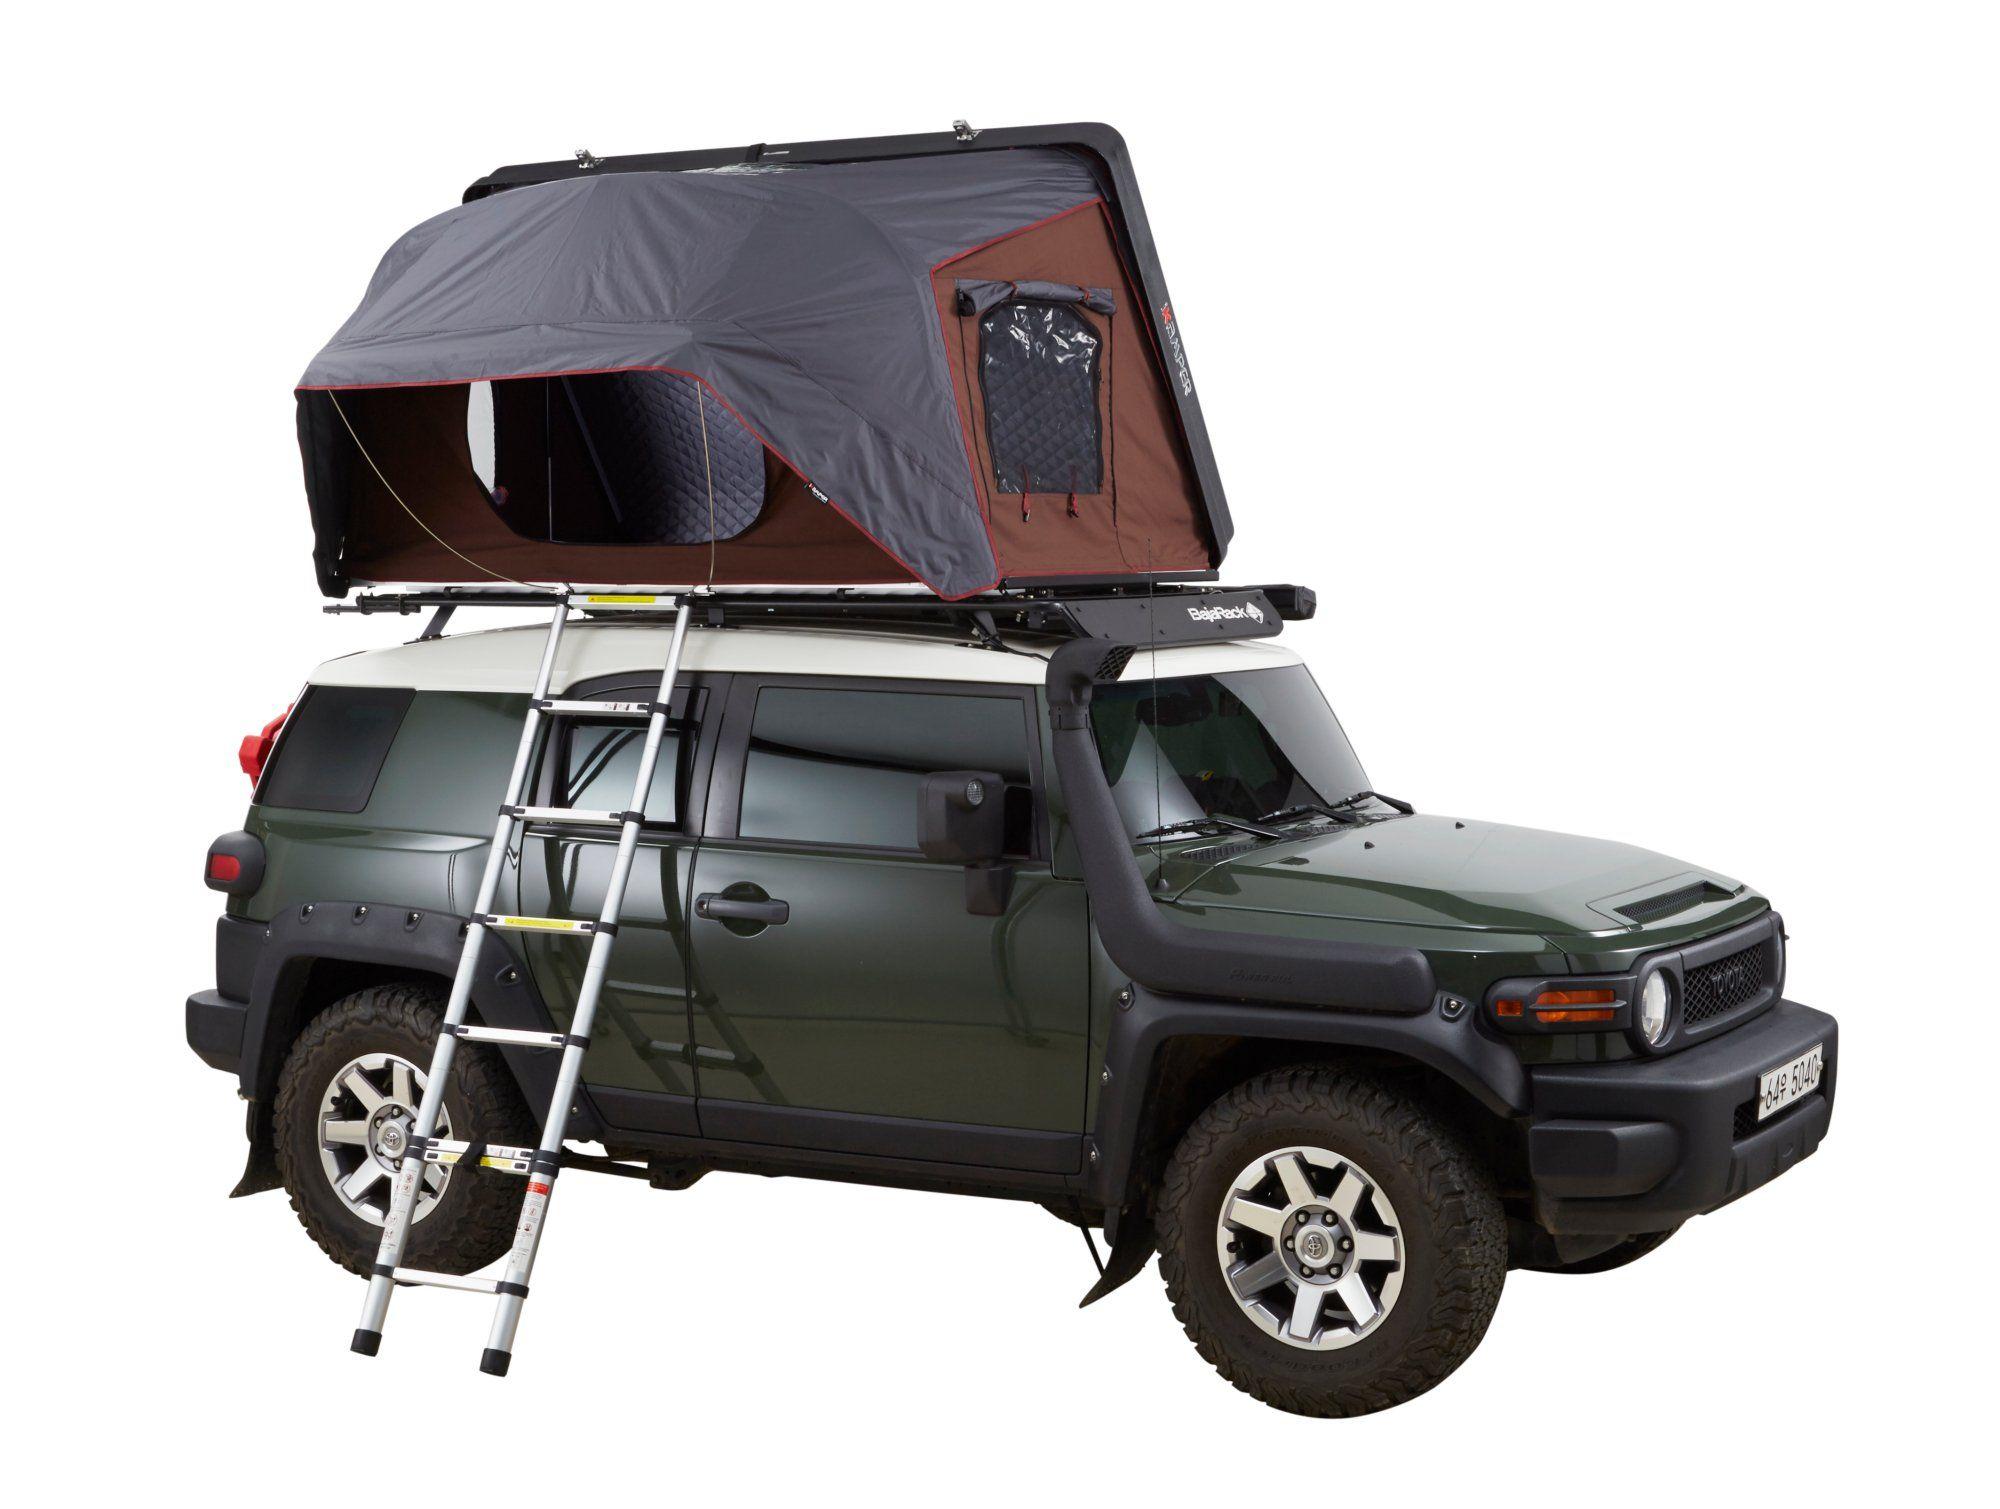 SKYCAMP 2X 1 Min Setup, Extra Storage Space Roof top